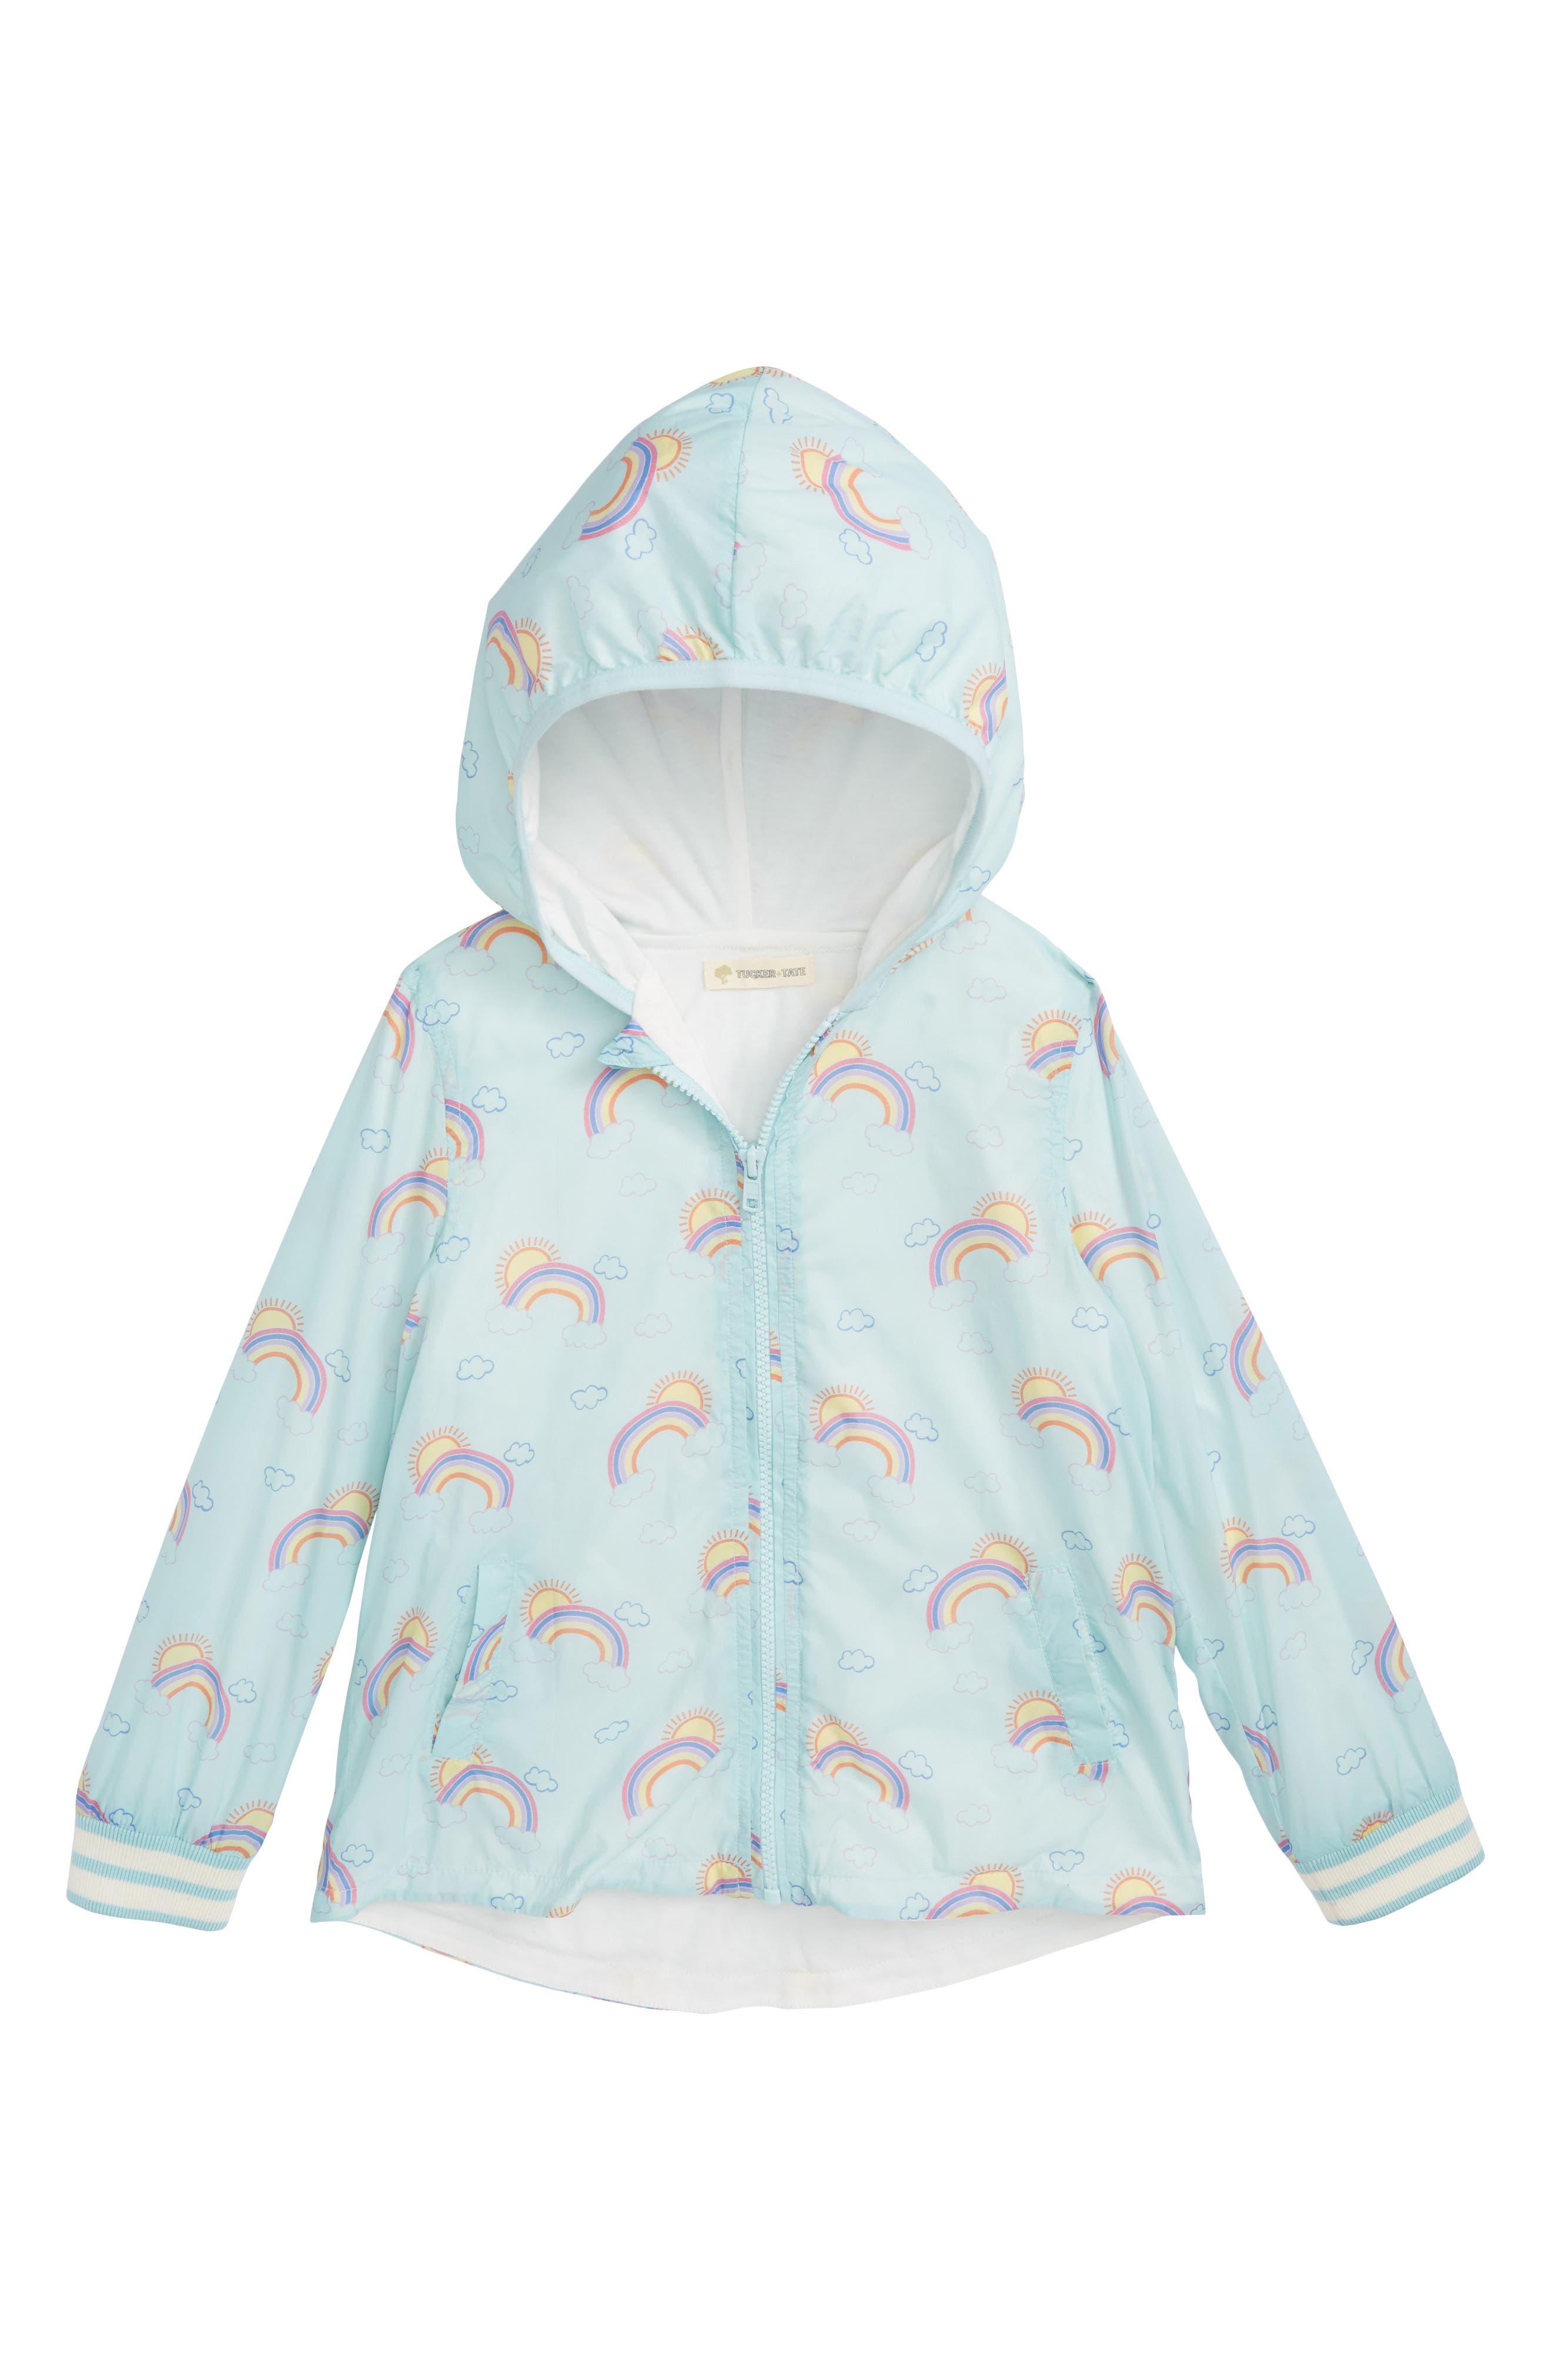 Rainbow Print Hooded Jacket,                         Main,                         color, Blue Glow Rainbows